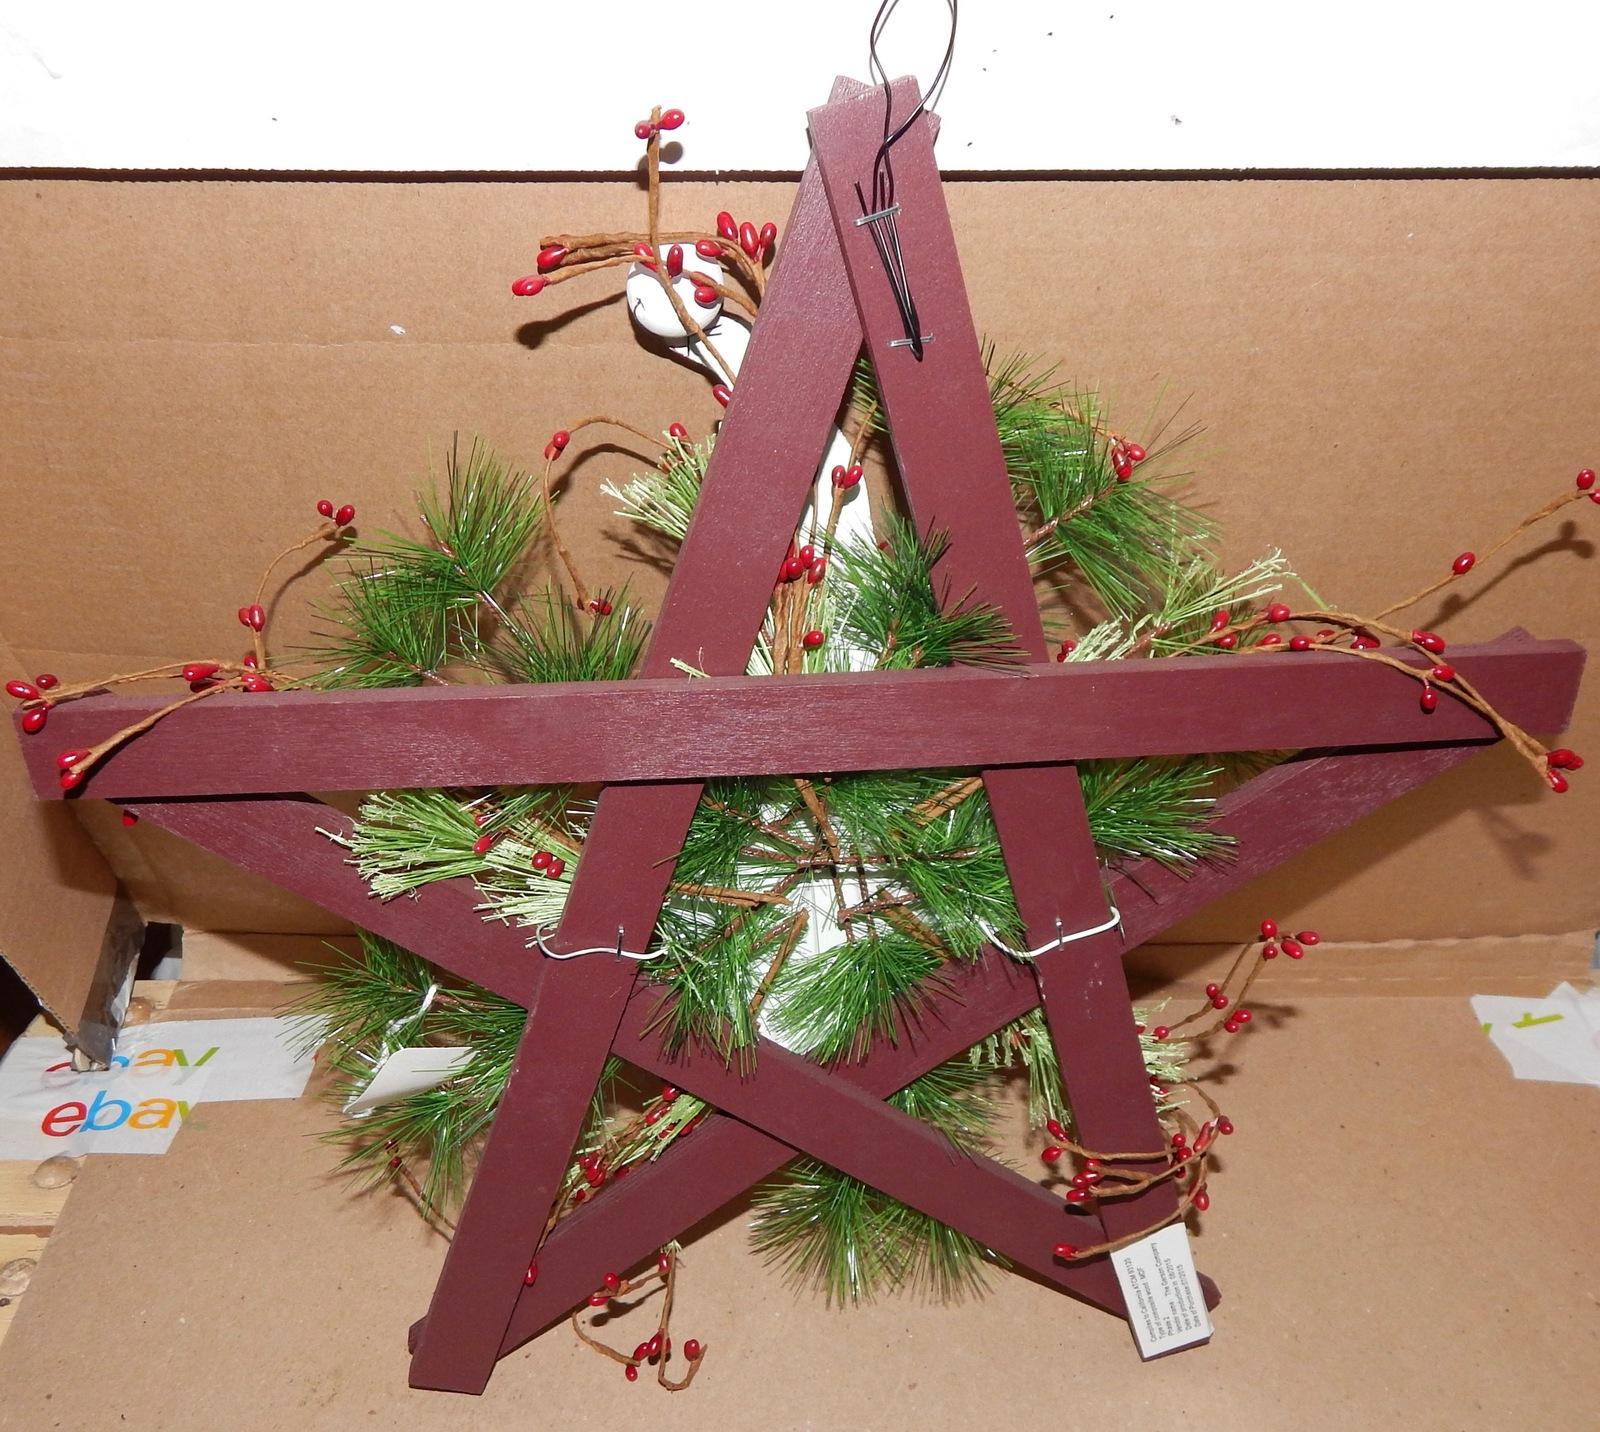 "Christmas Hanging Wall Decor Bottle Cap Santa On Star Wood Wreath 16"" USA 156D"